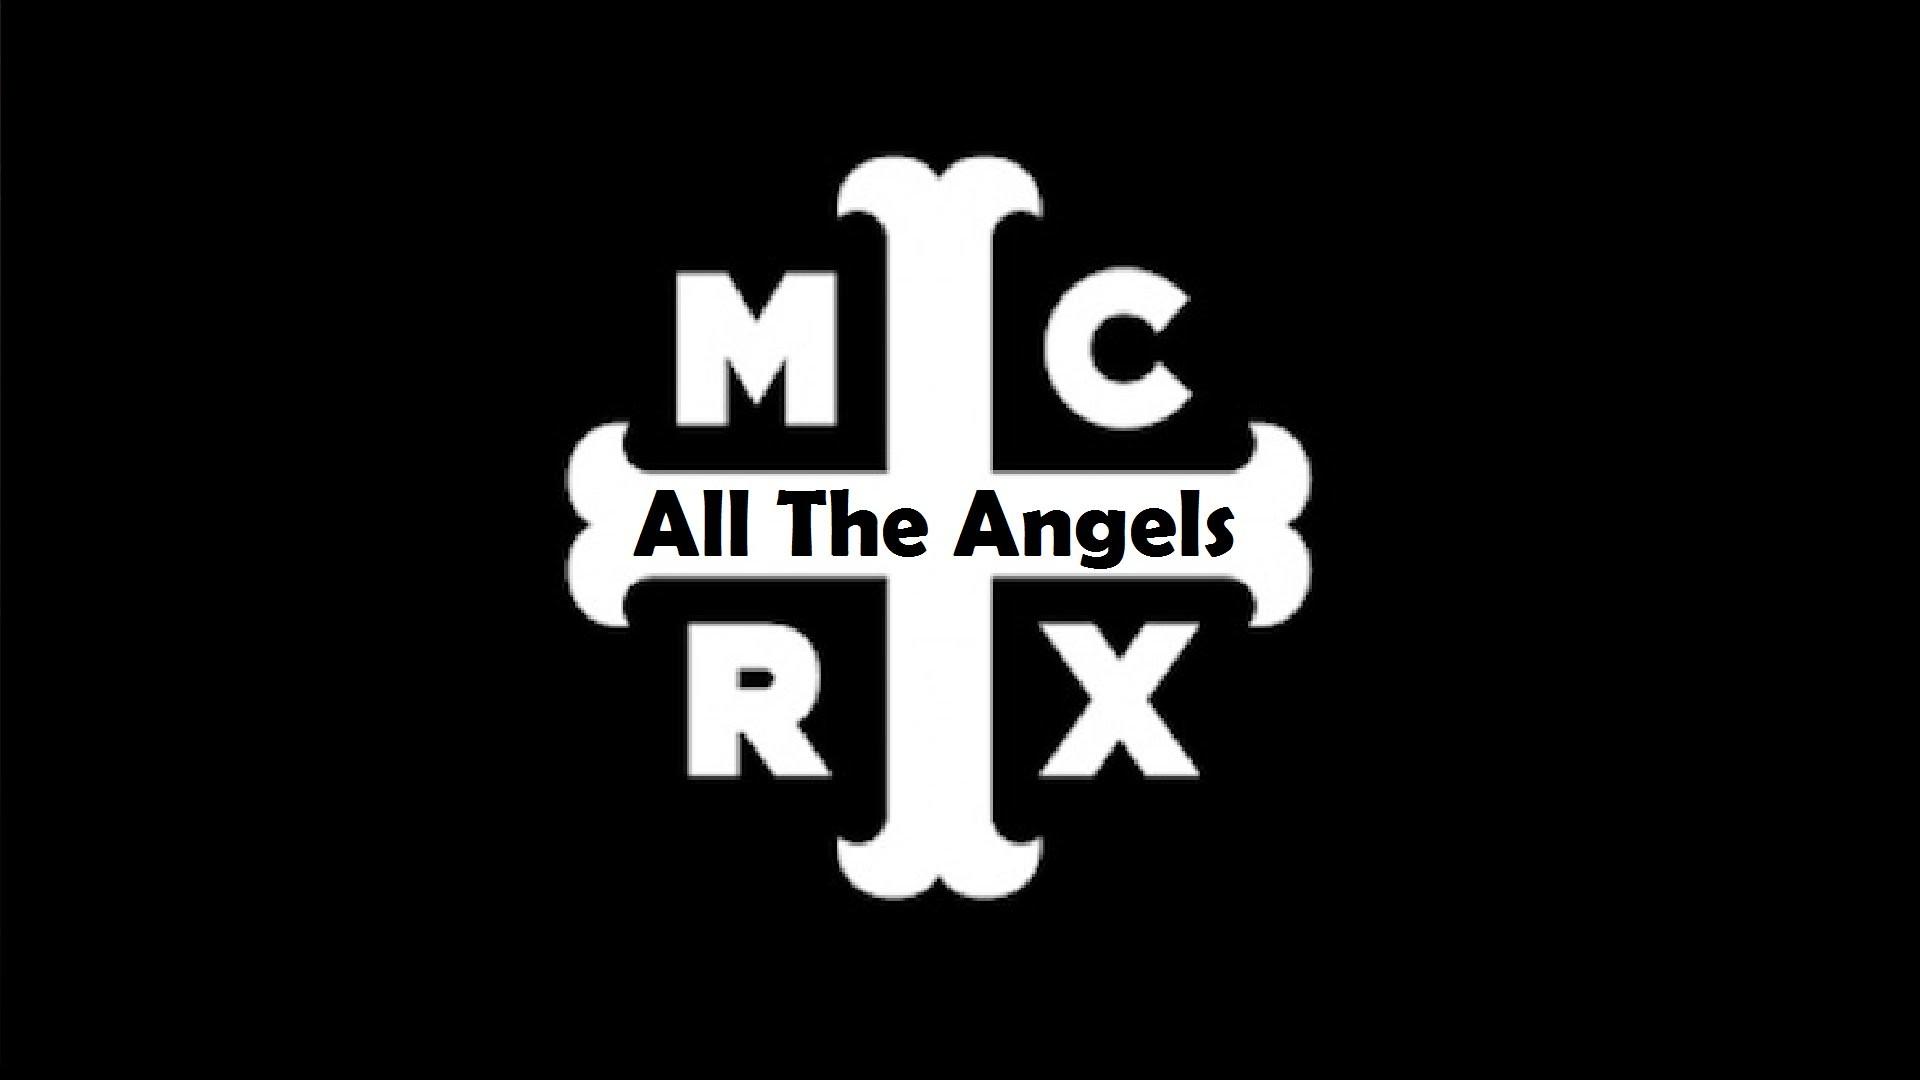 My Chemical Romance – All The Angels Lyrics